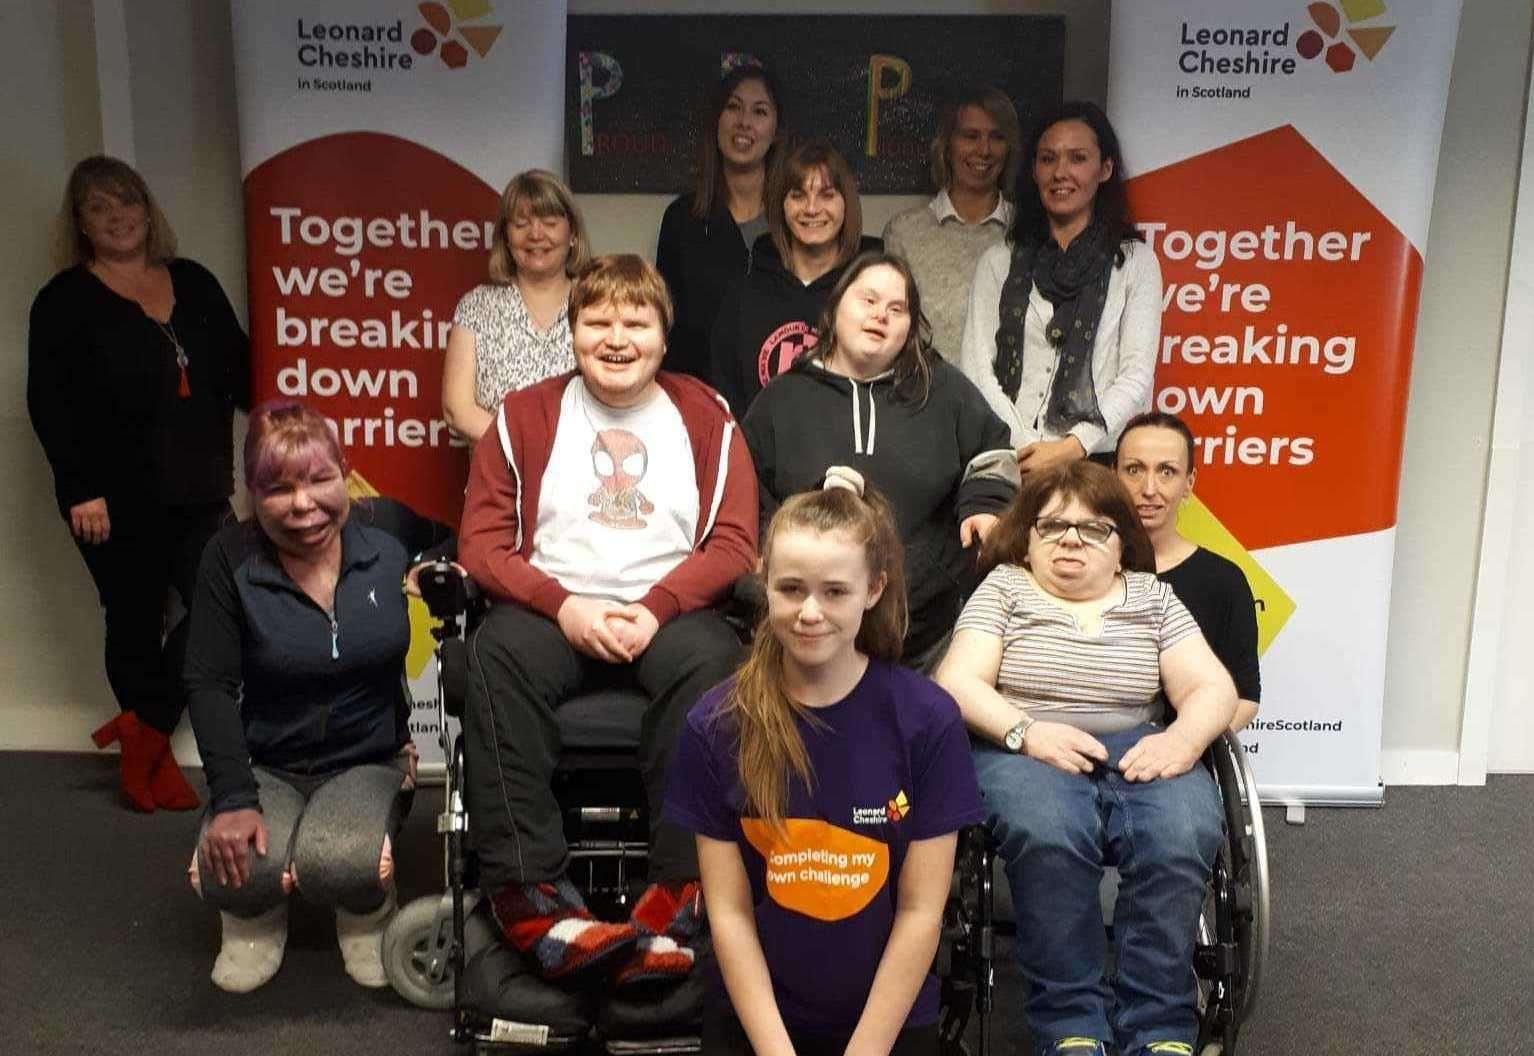 Teenage volunteer recognised for her groundbreaking work with disabled people